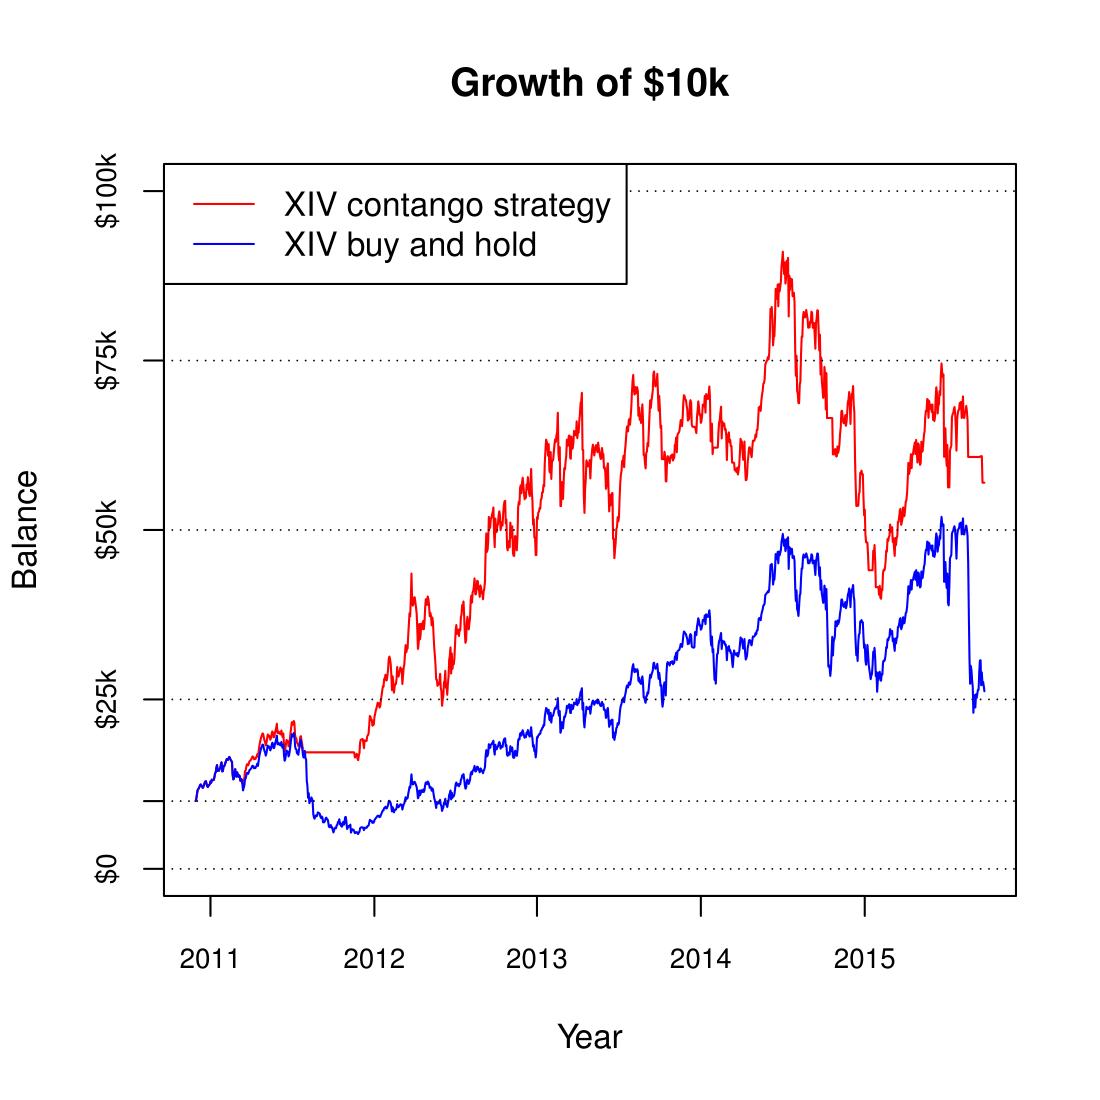 Vxx xiv arbitrage betting martingale betting system mathematical analysis zorich